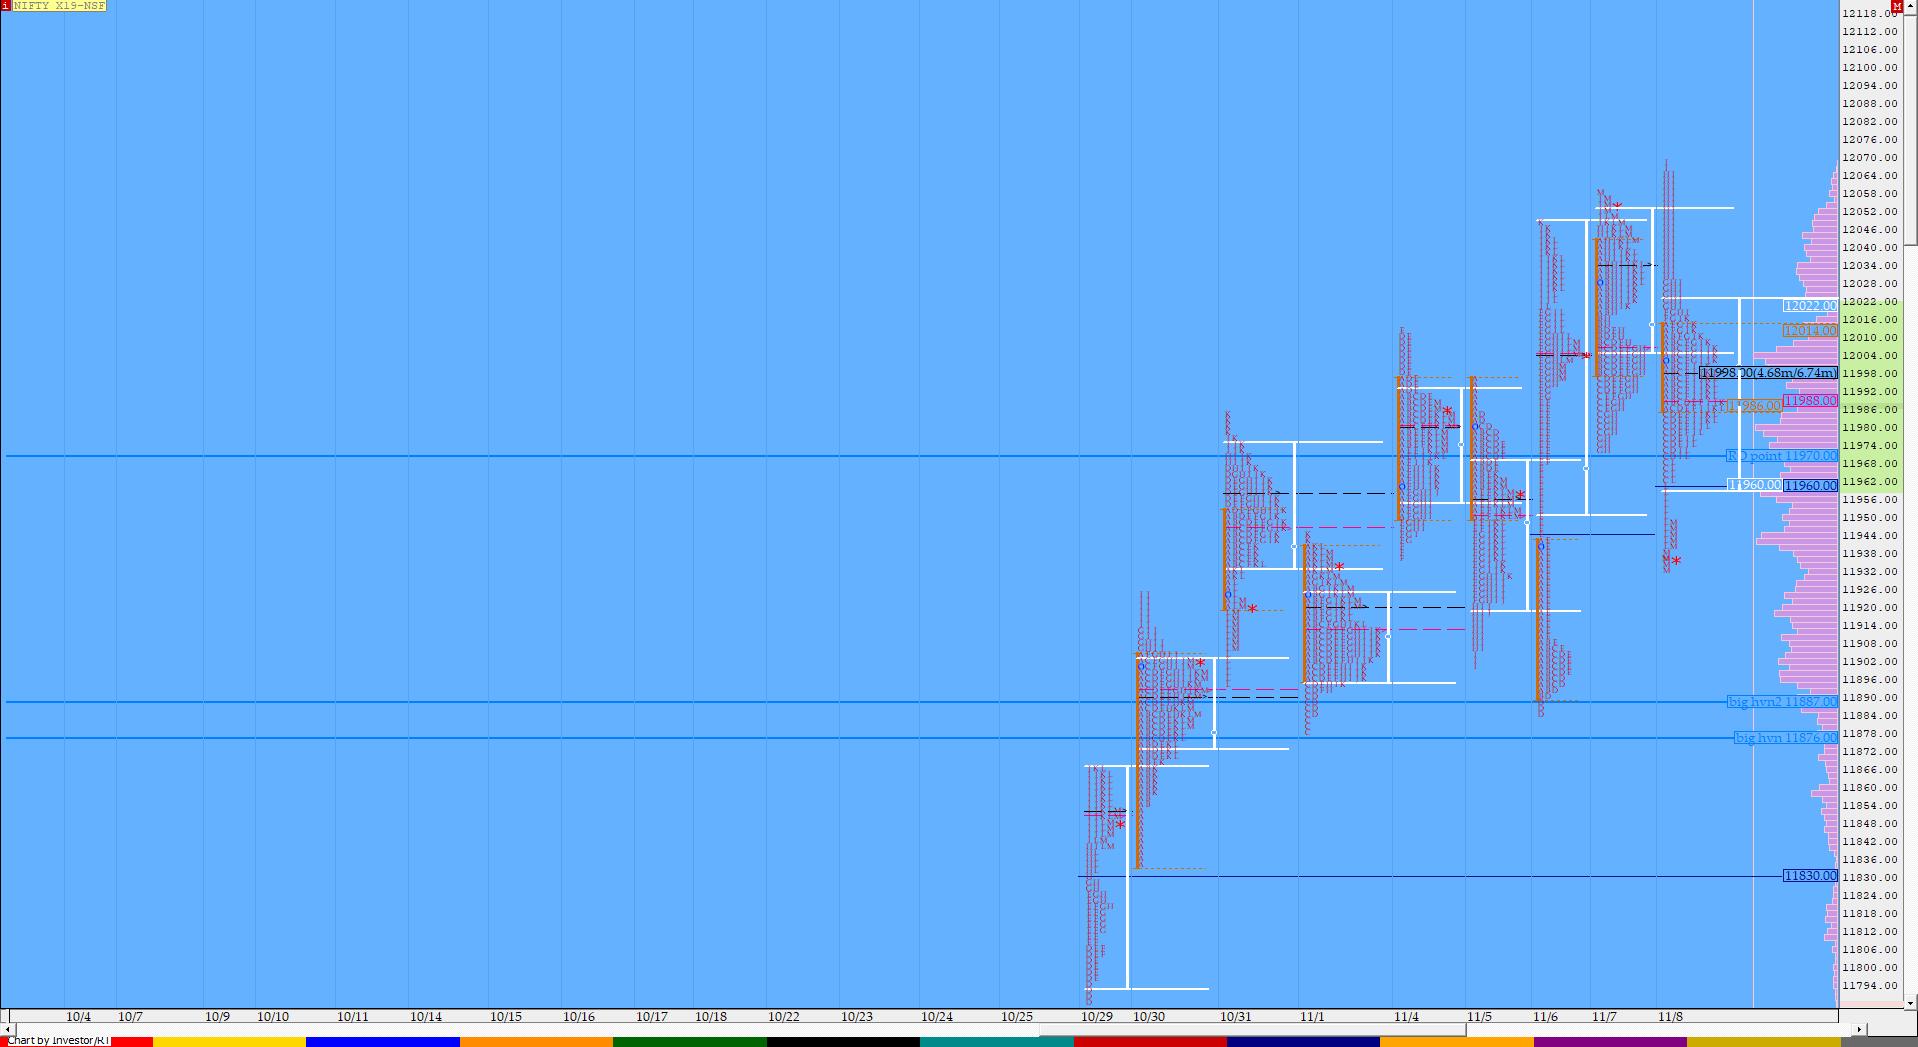 Market Profile Analysis dated 8th November 2